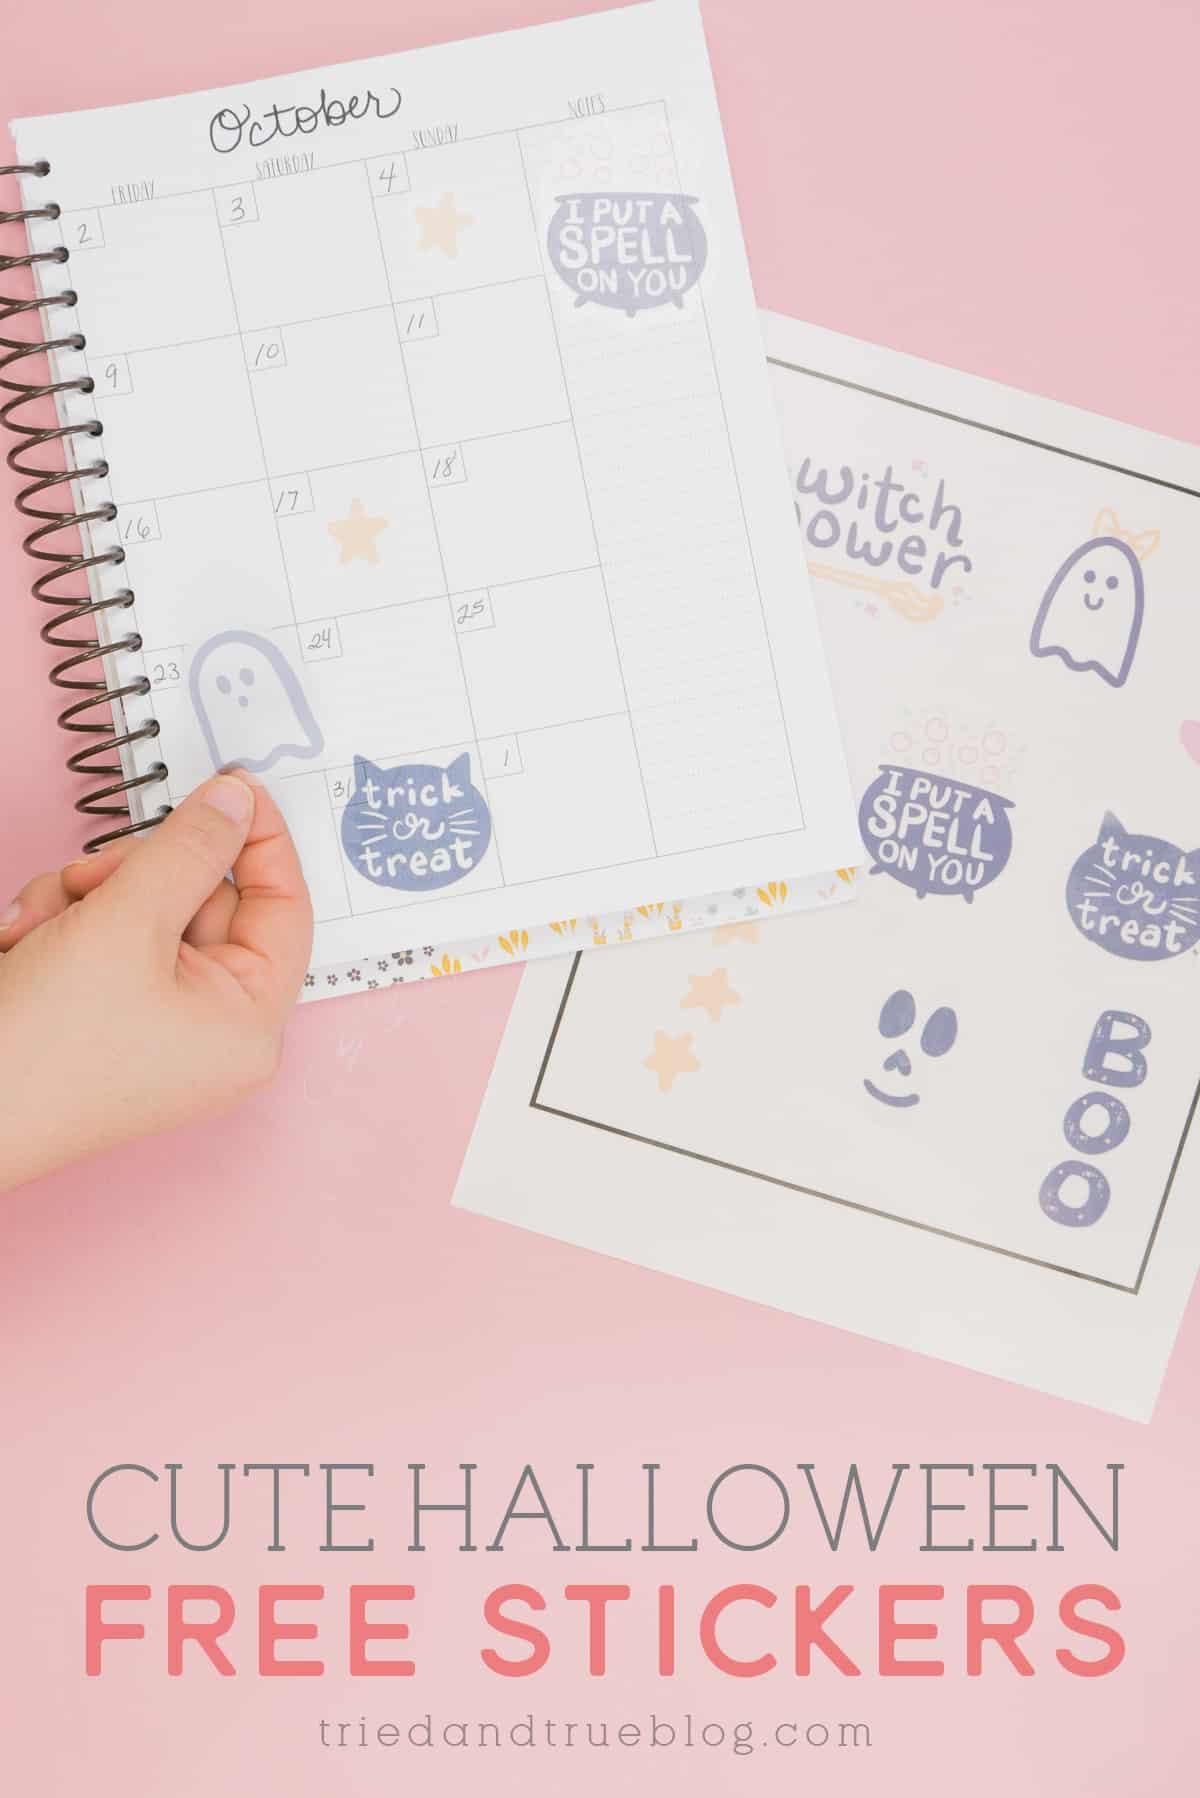 Cute Halloween Stickers-EDIT01